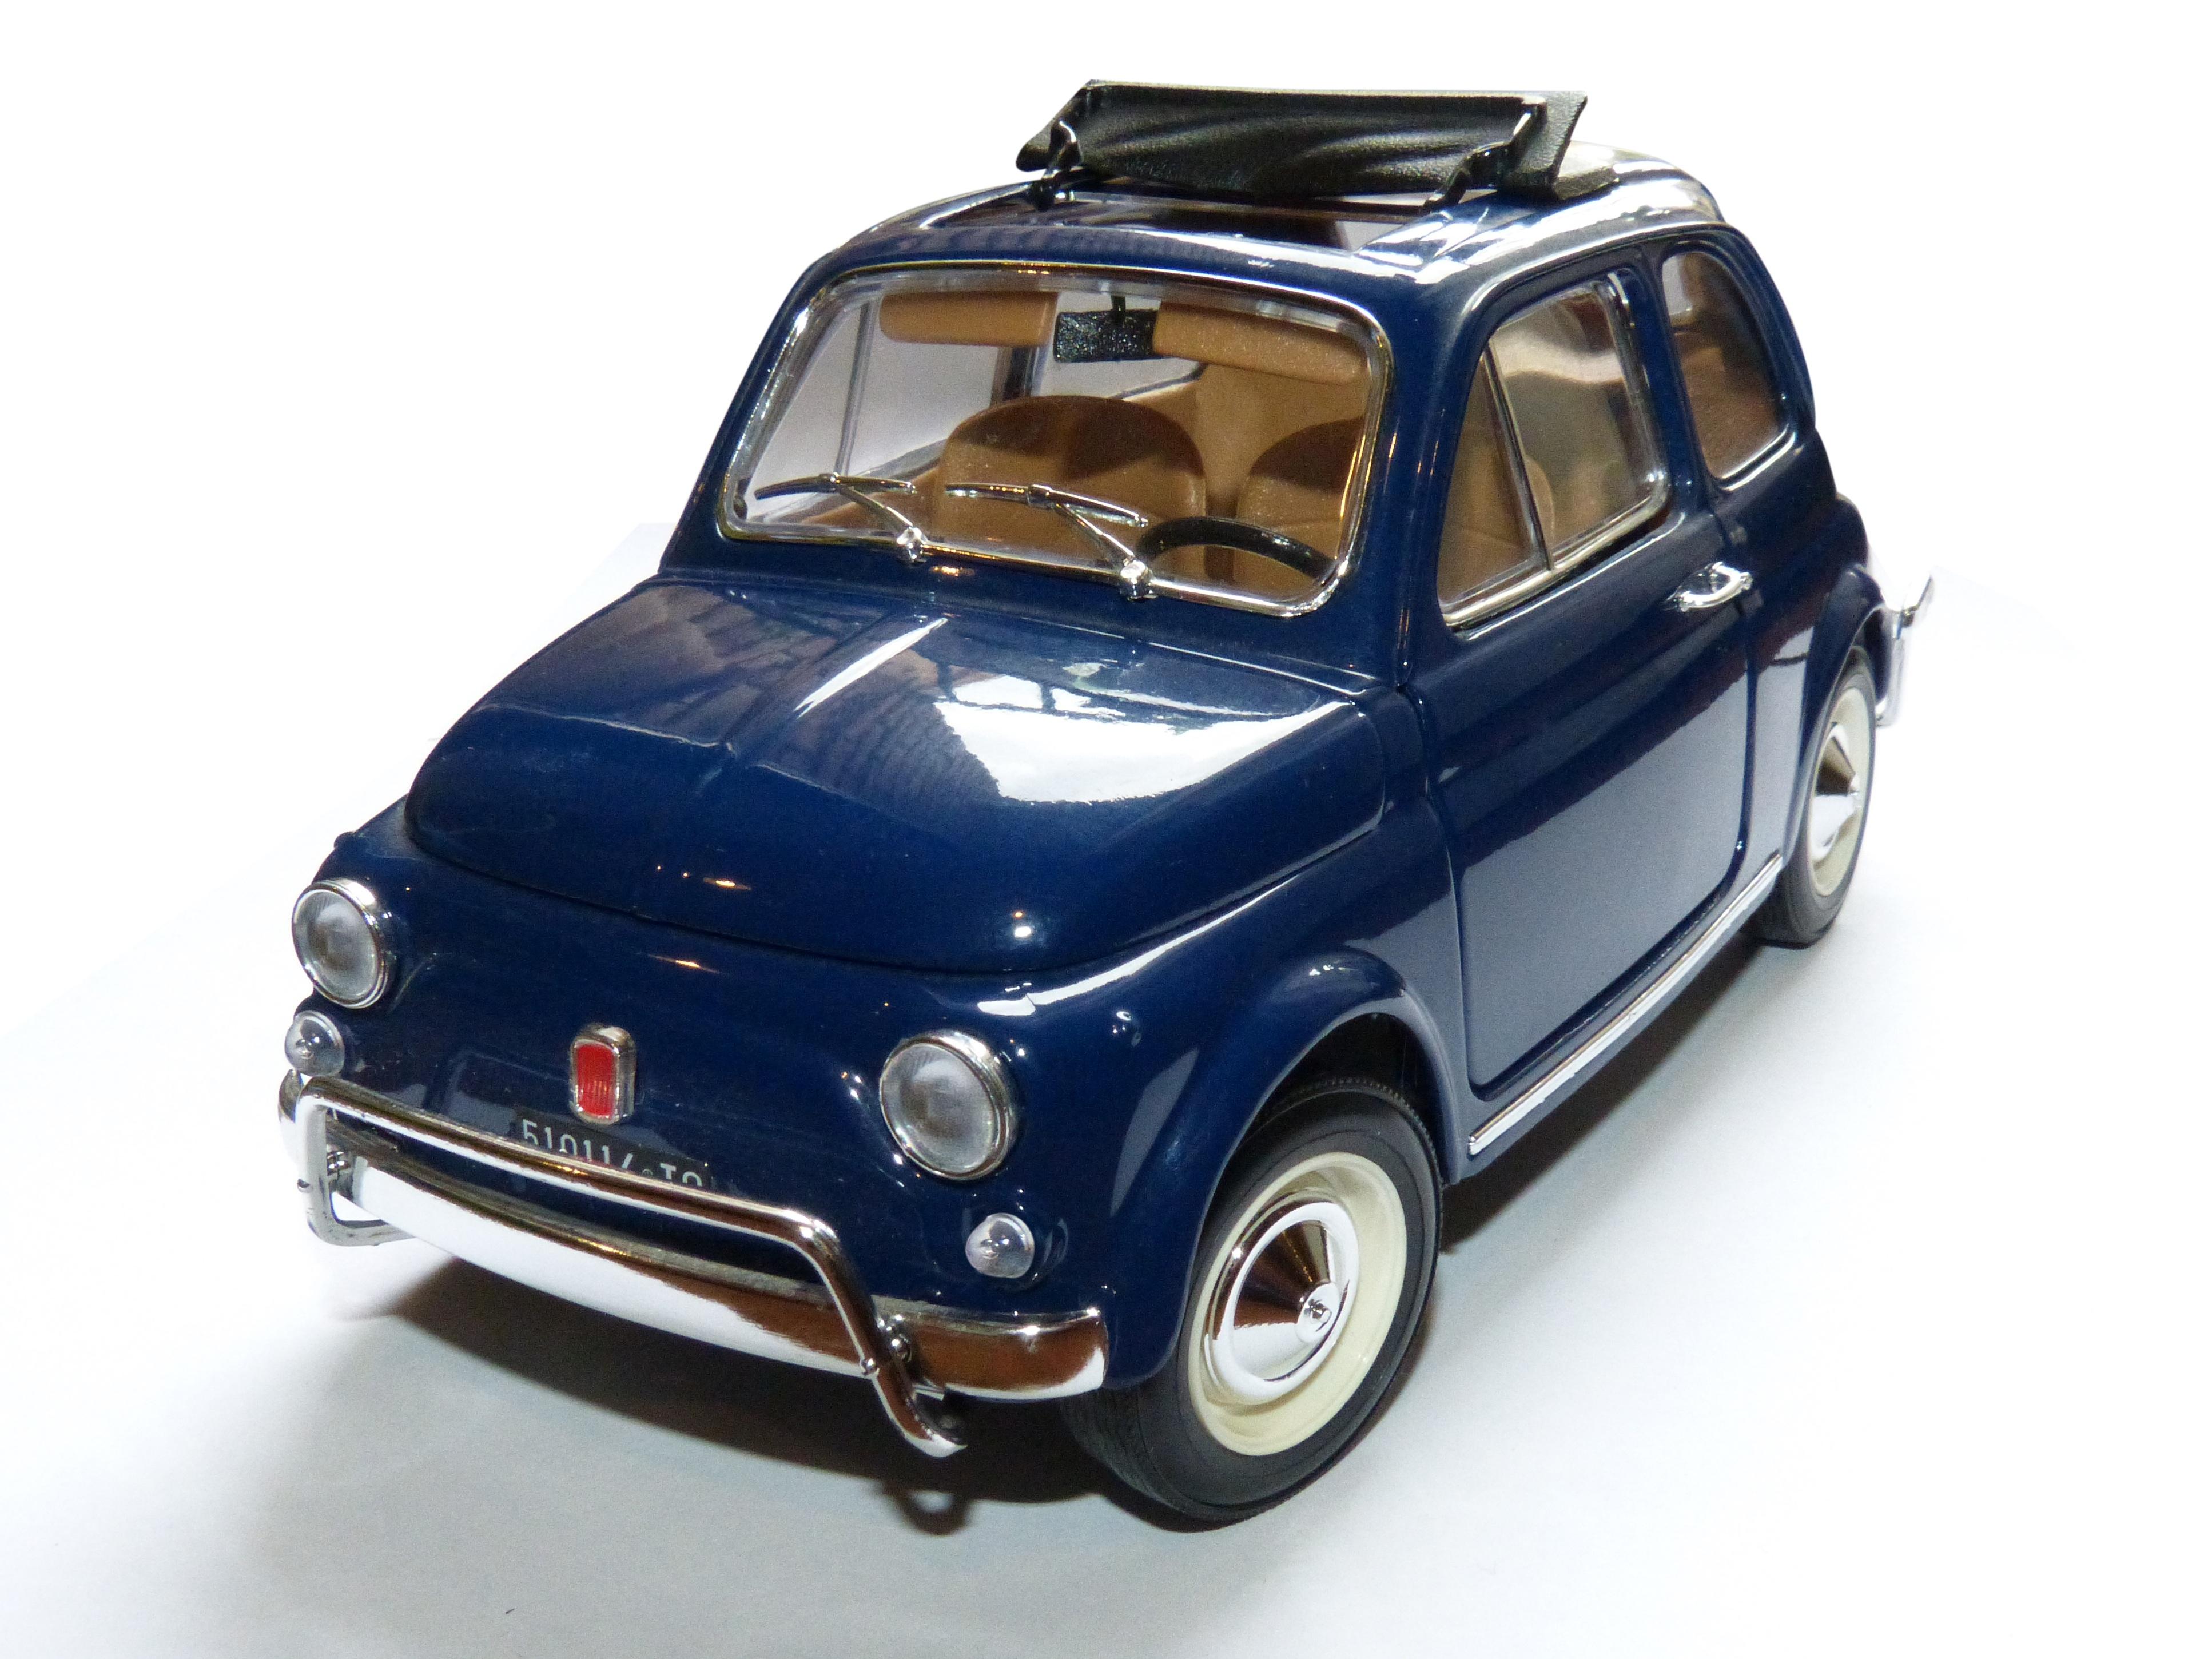 Free Images Miniature Fiat 500 Toy Car City Car Model Car